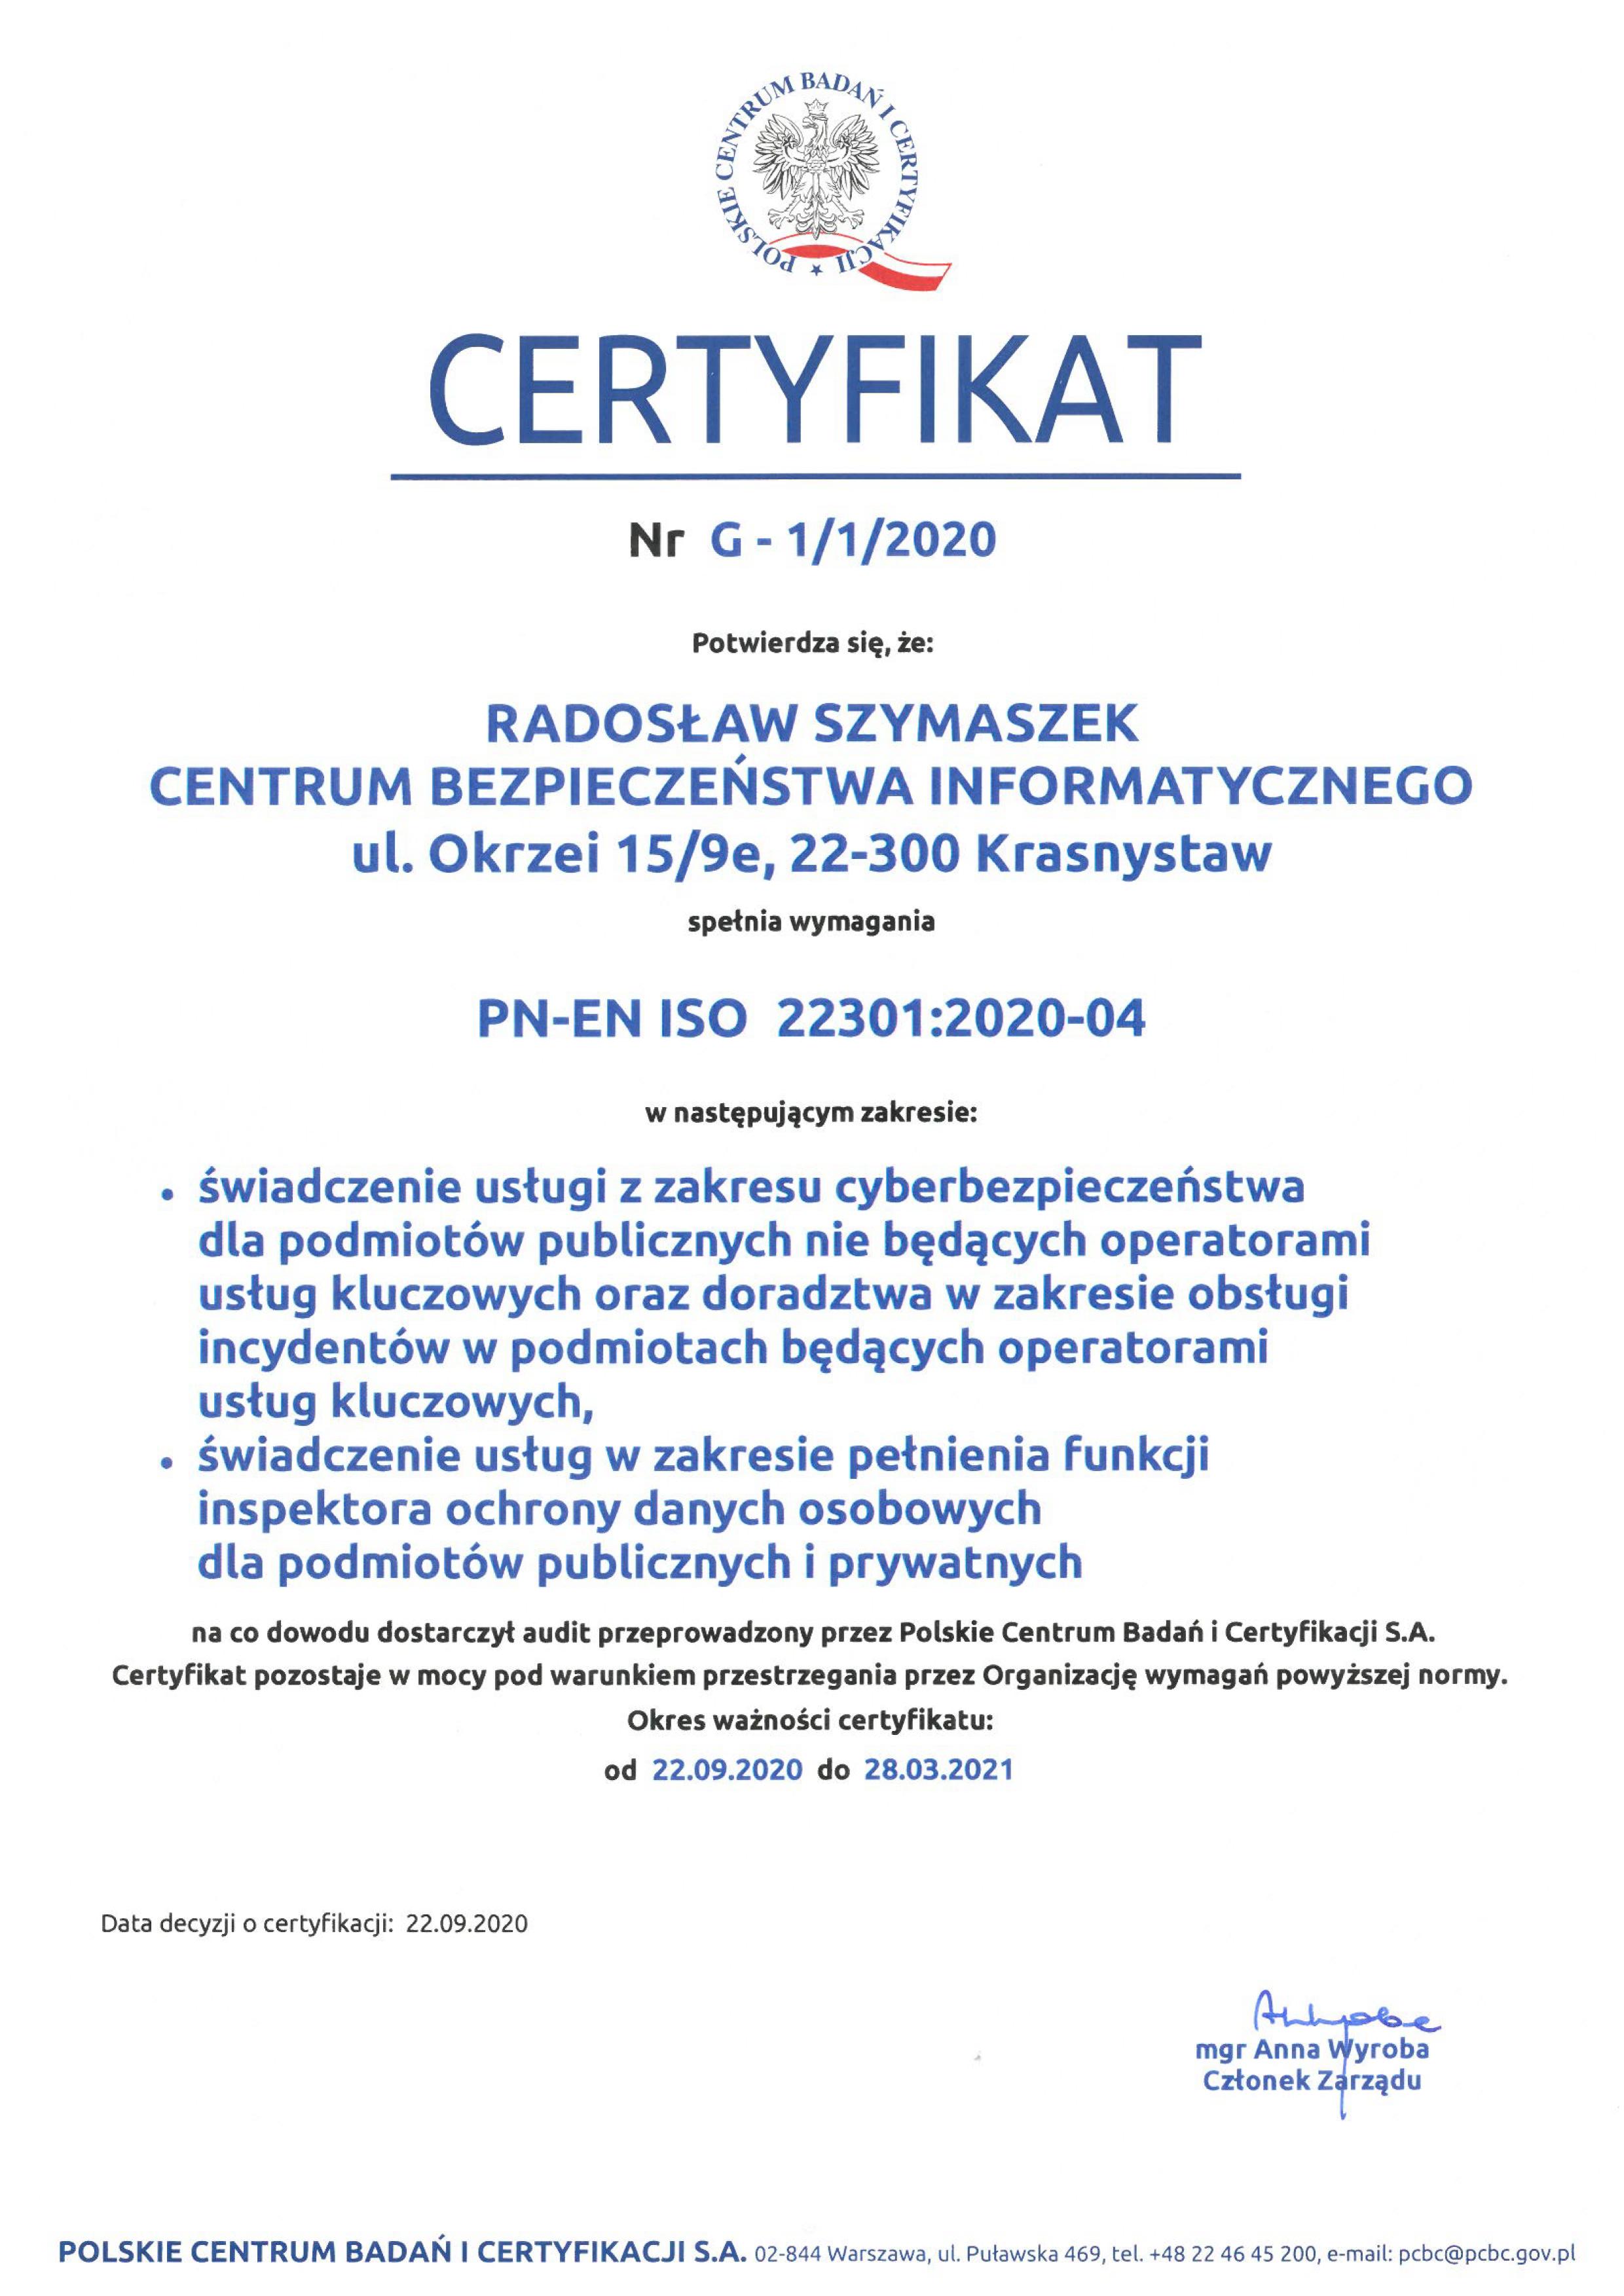 CBI_Certyfikat ISO 22301_01